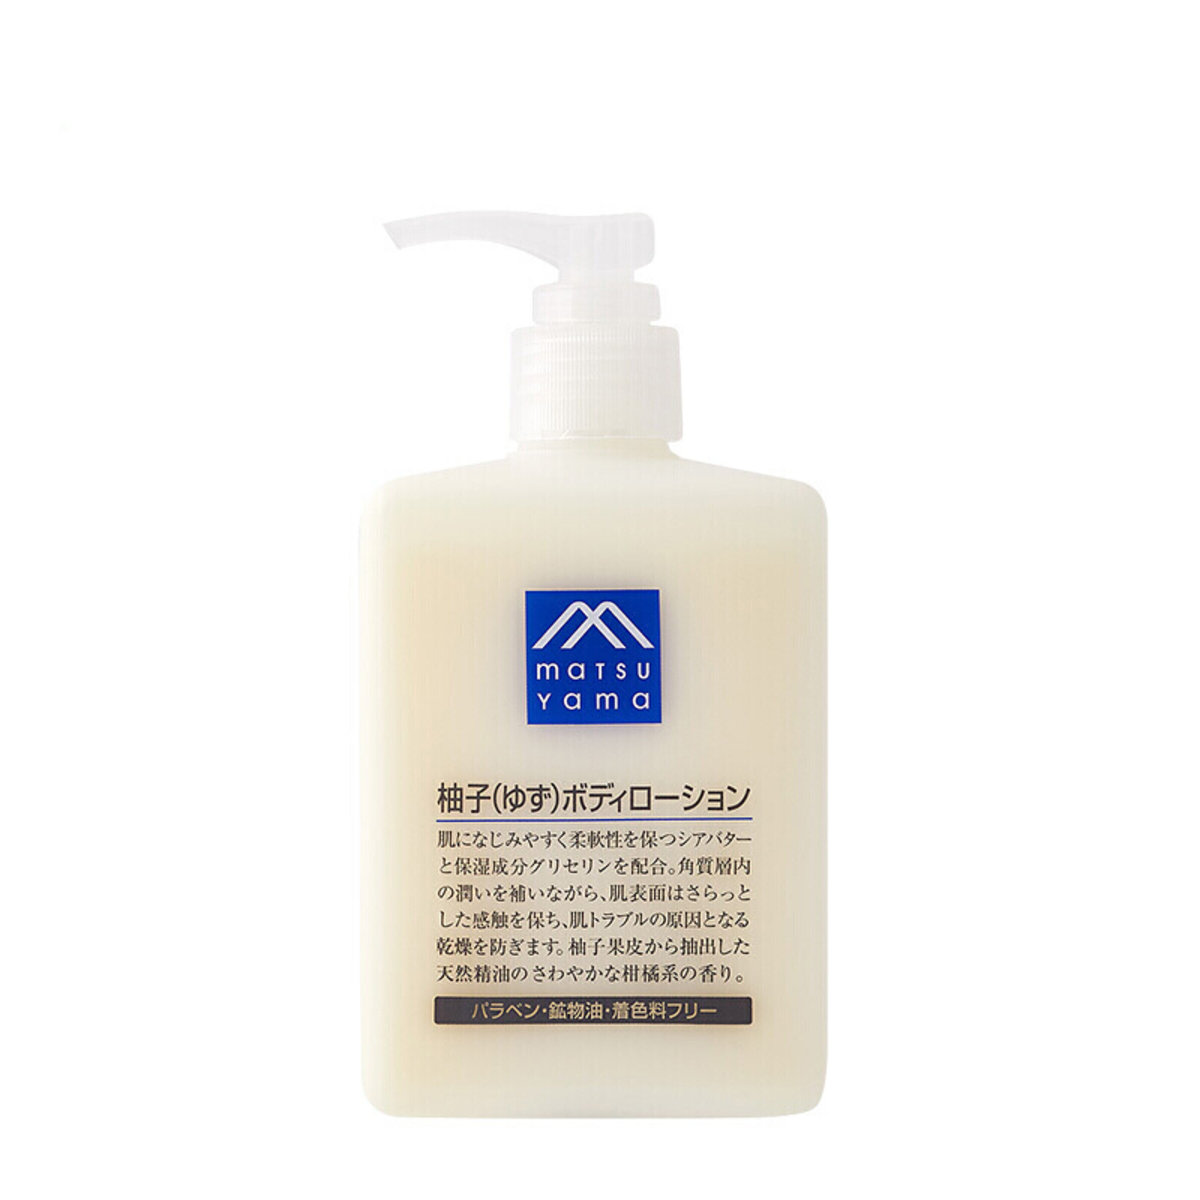 YUZU body lotion 300ml (parallel import)